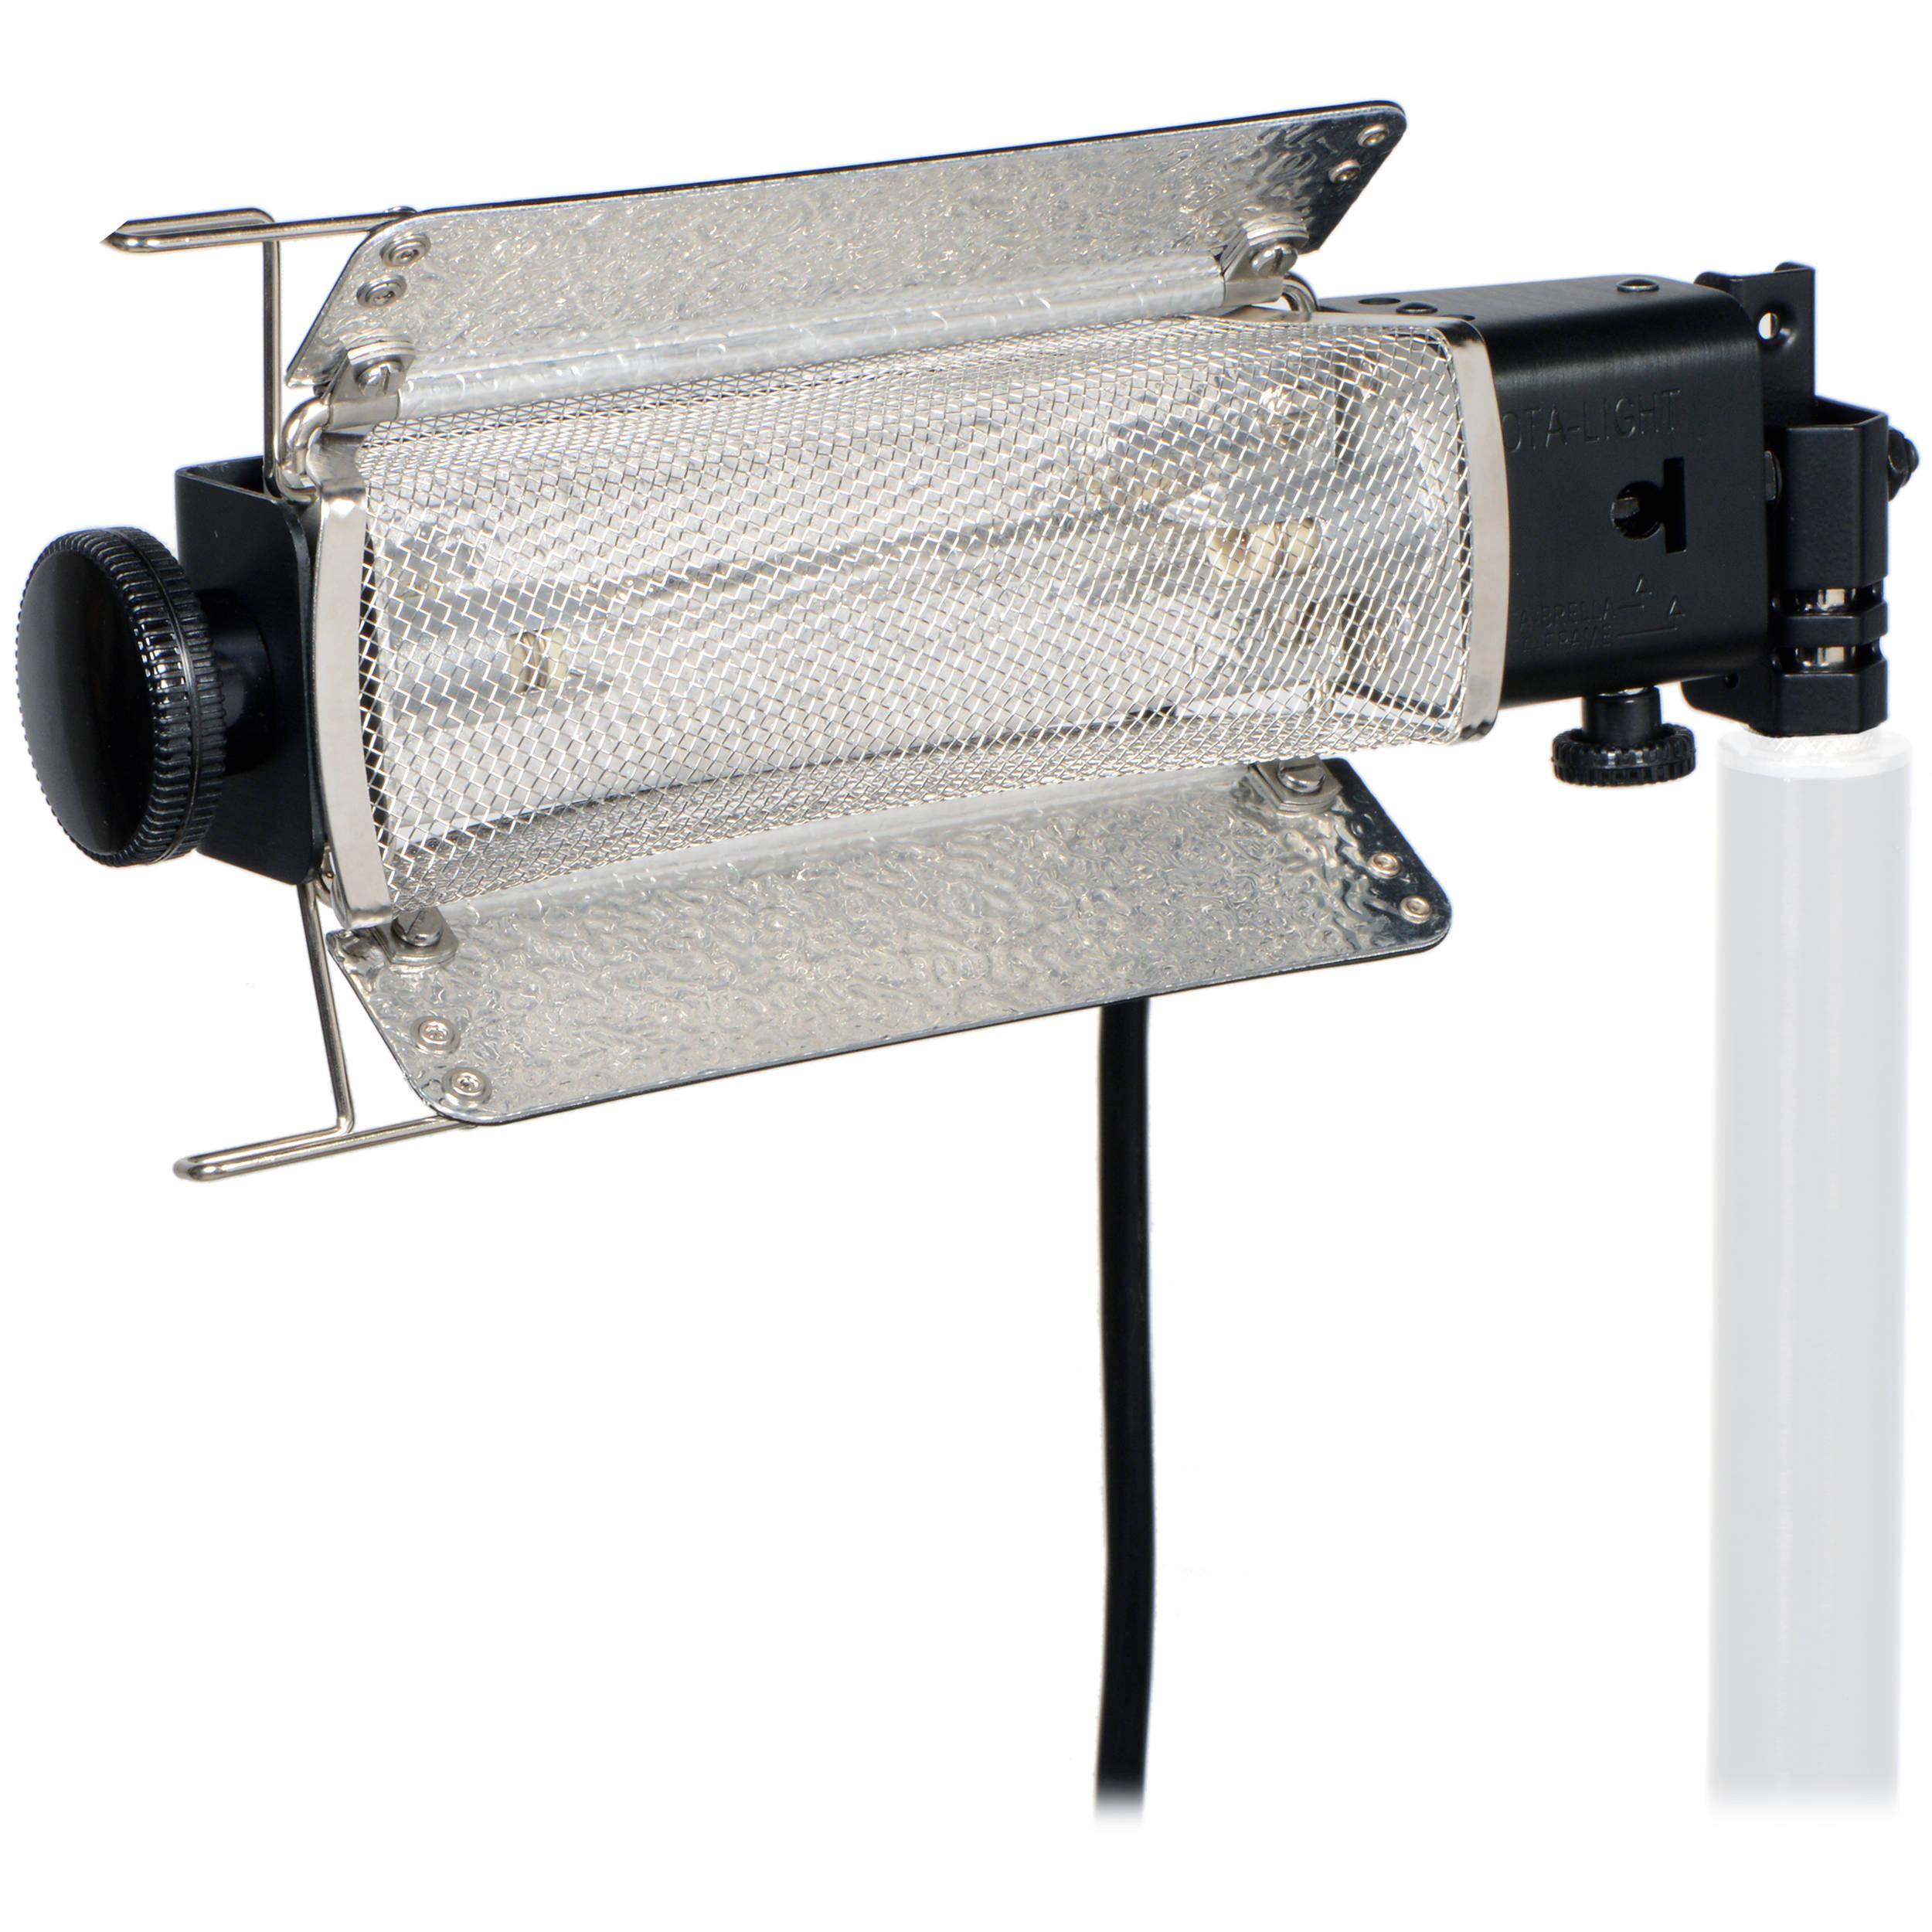 Lowel Tota-Light Tungsten Flood Light (120-240VAC)  sc 1 st  Bu0026H & Lowel Tota-Light Tungsten Flood Light (120-240VAC) T1-10 Bu0026H azcodes.com